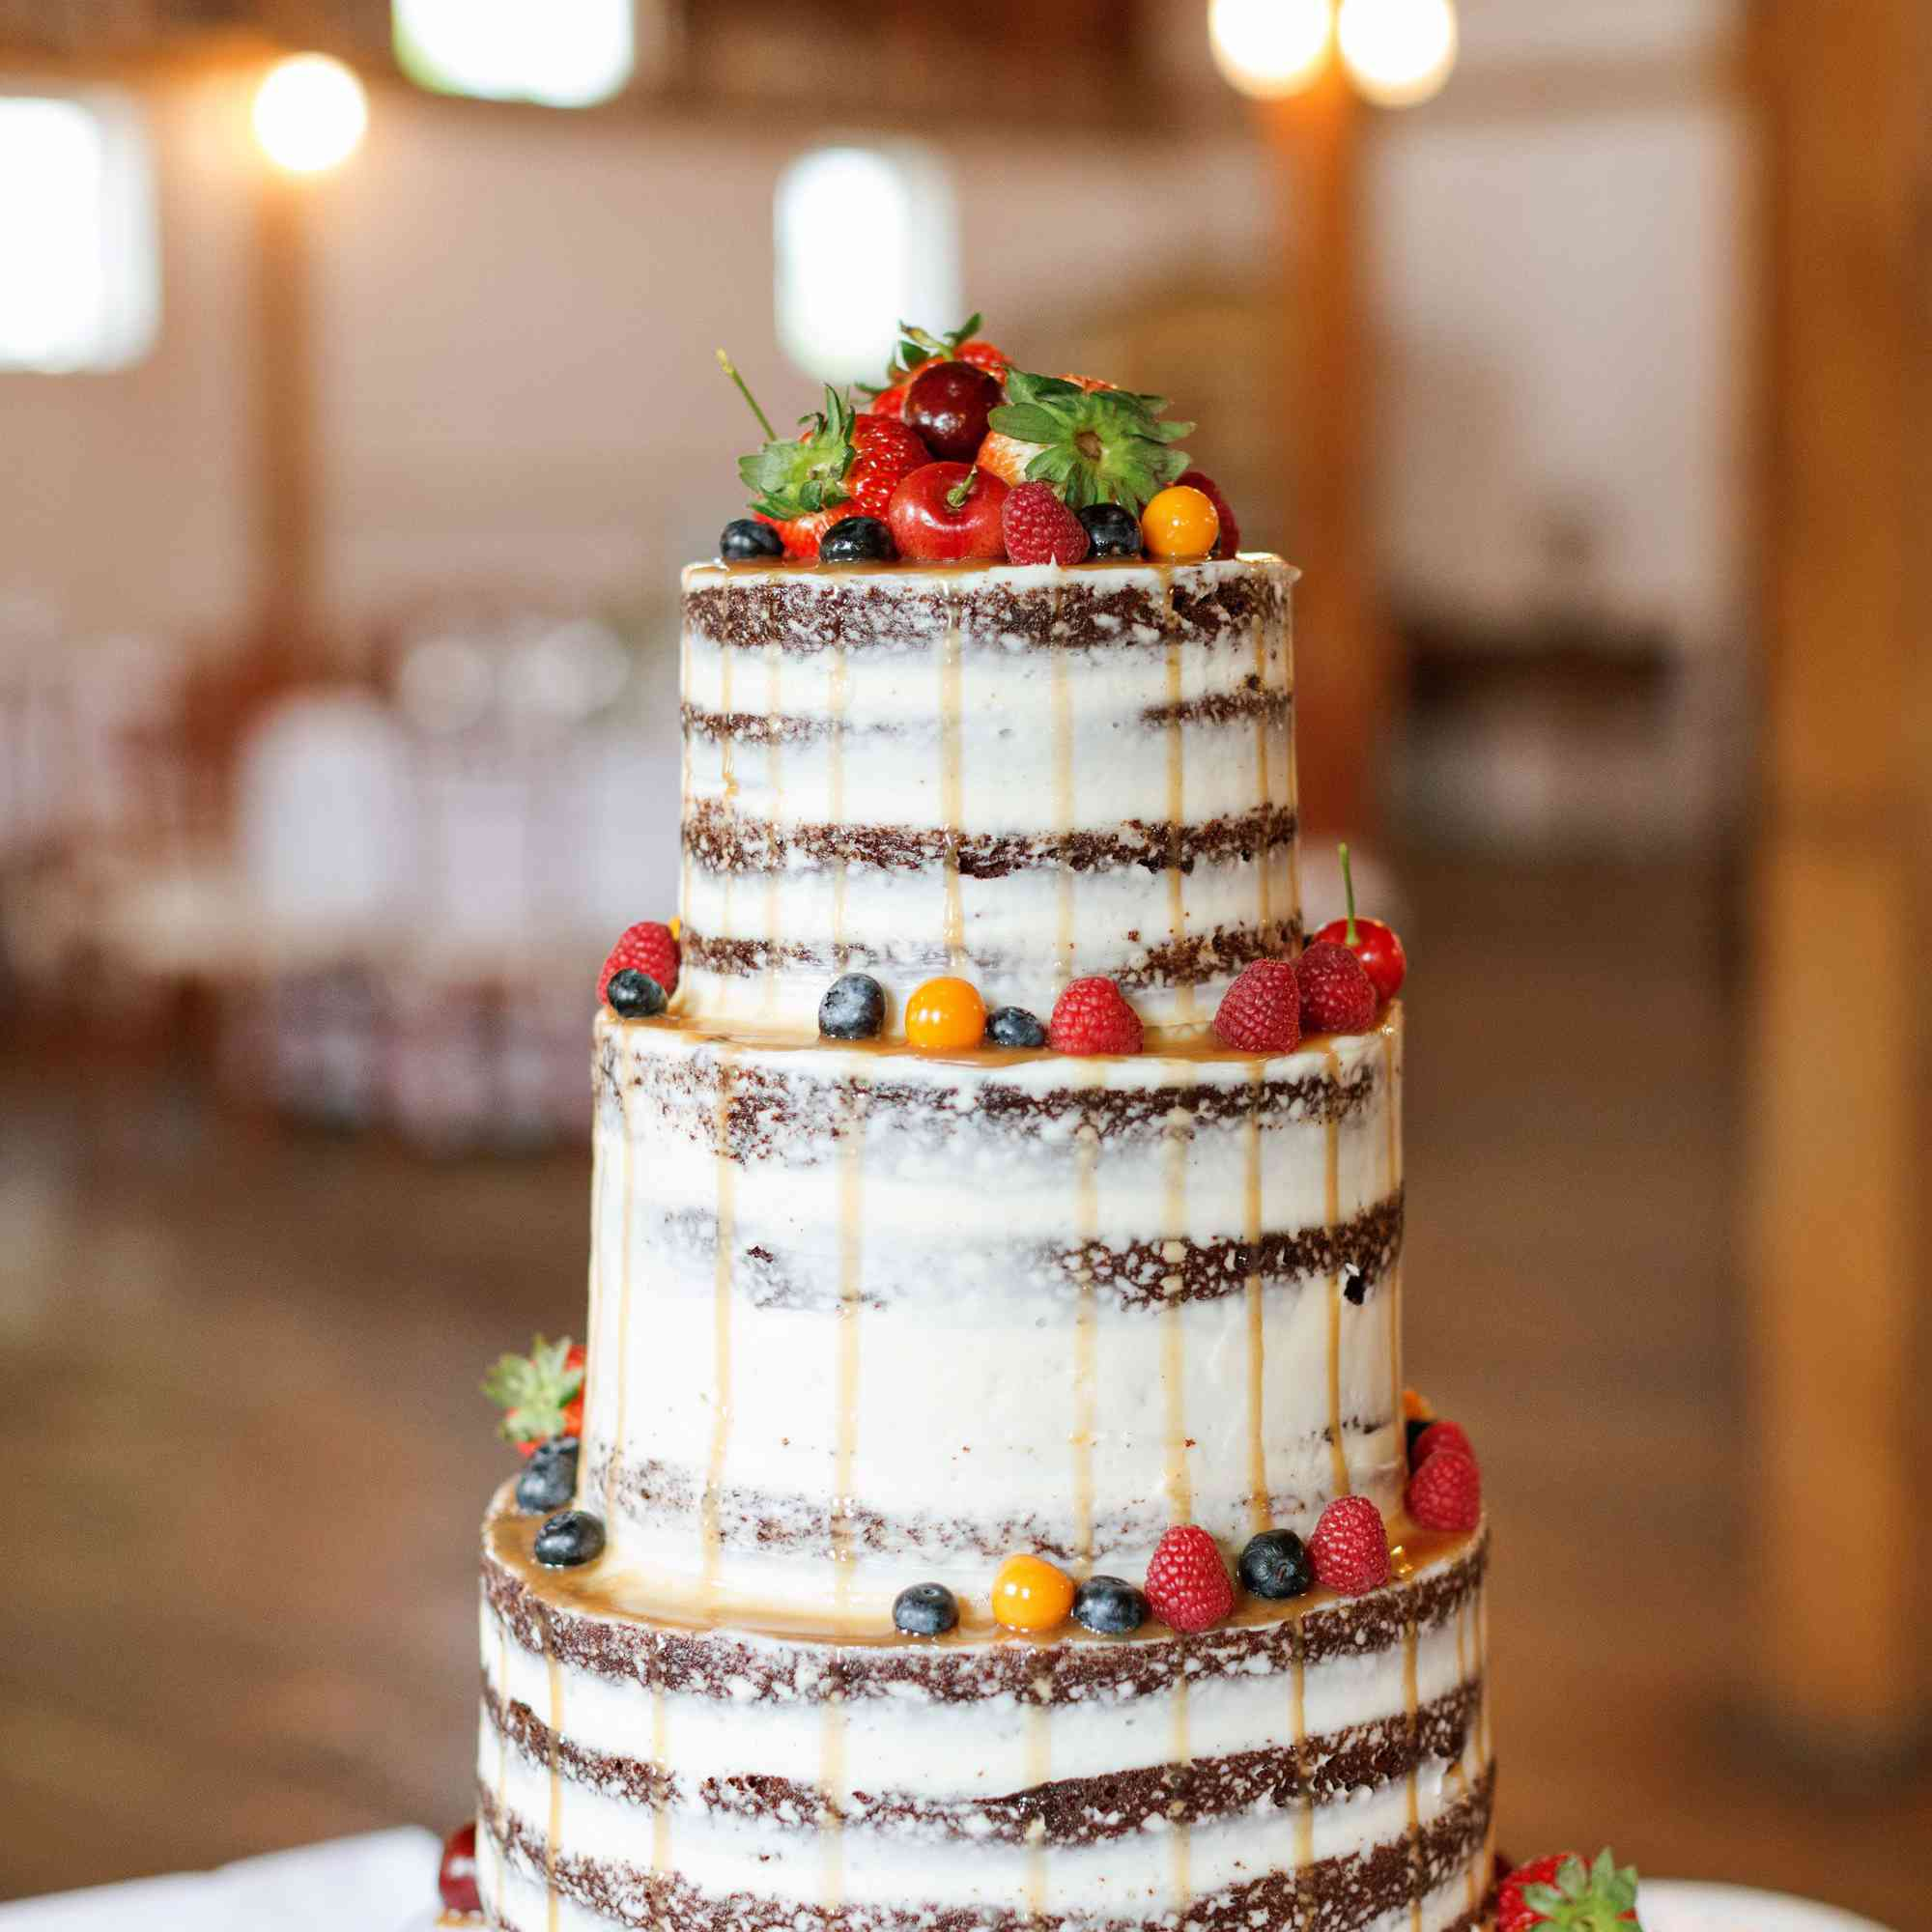 Naked cake with fruit and caramel